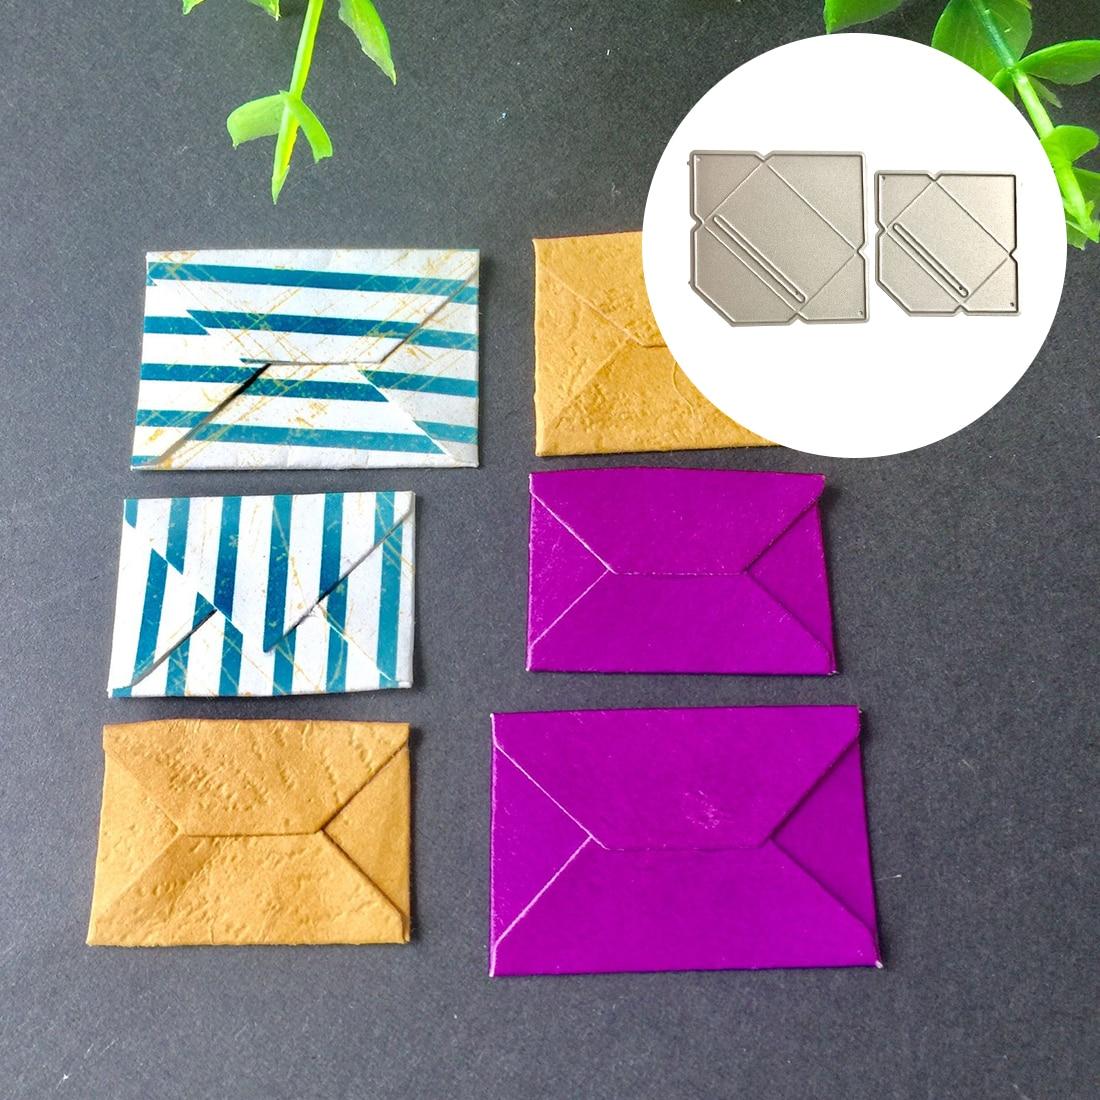 2 pçs pop up envelope metal cortes de corte dados para diy scrapbooking gravando cartões de papel que fazem suprimentos de artesanato decorativo